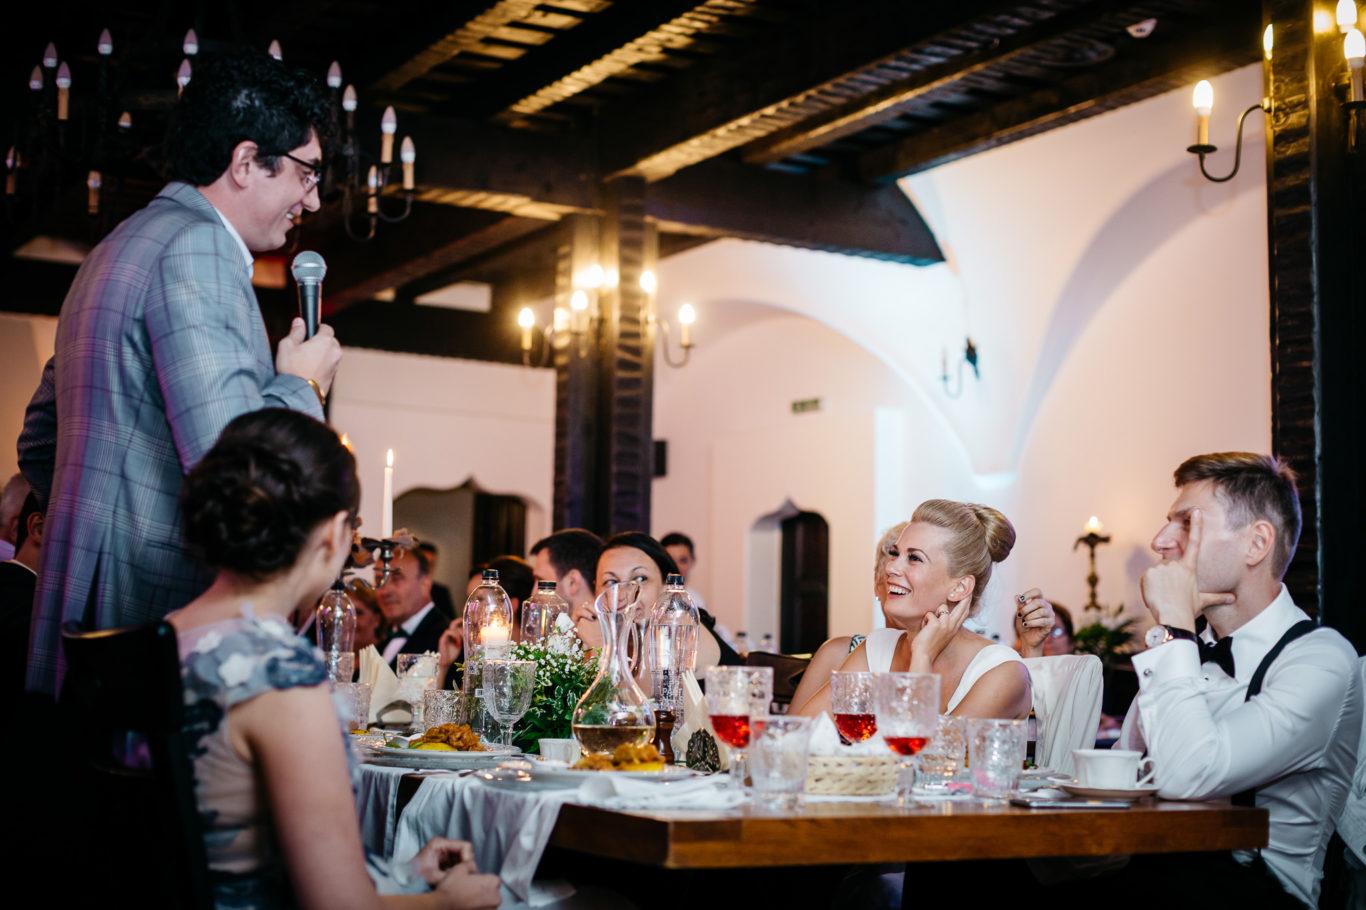 0733-fotoreportaj-nunta-conacul-maldar-cristina-stefan-fotograf-ciprian-dumitrescu-cd2_4032